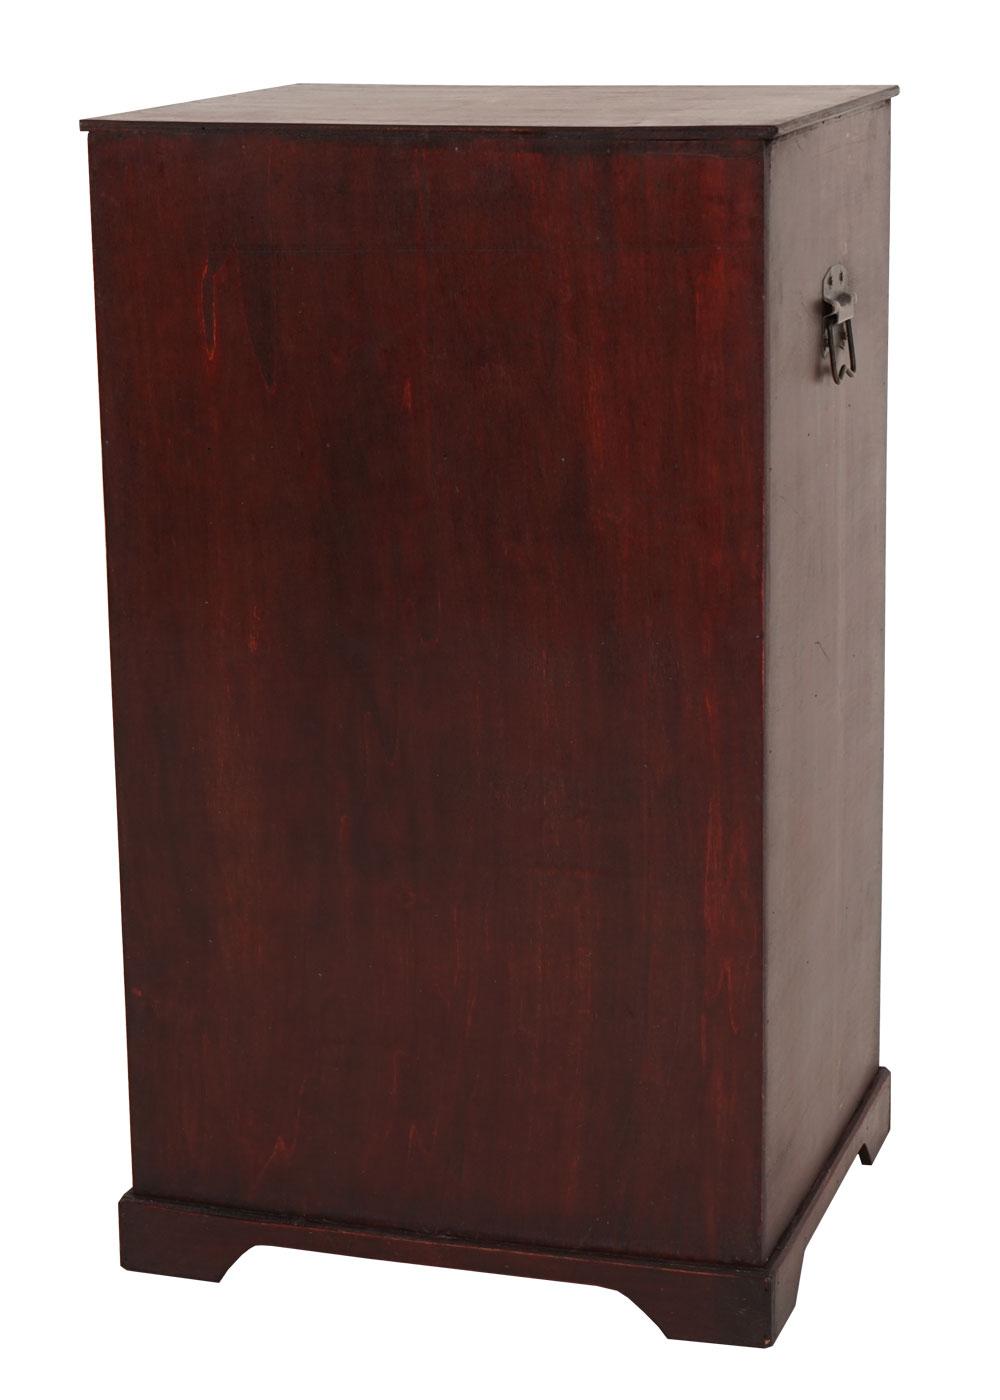 weinregal rhone t252 flaschenregal regal holzregal f r 16 flaschen kolonialstil 66x38x34 cm. Black Bedroom Furniture Sets. Home Design Ideas